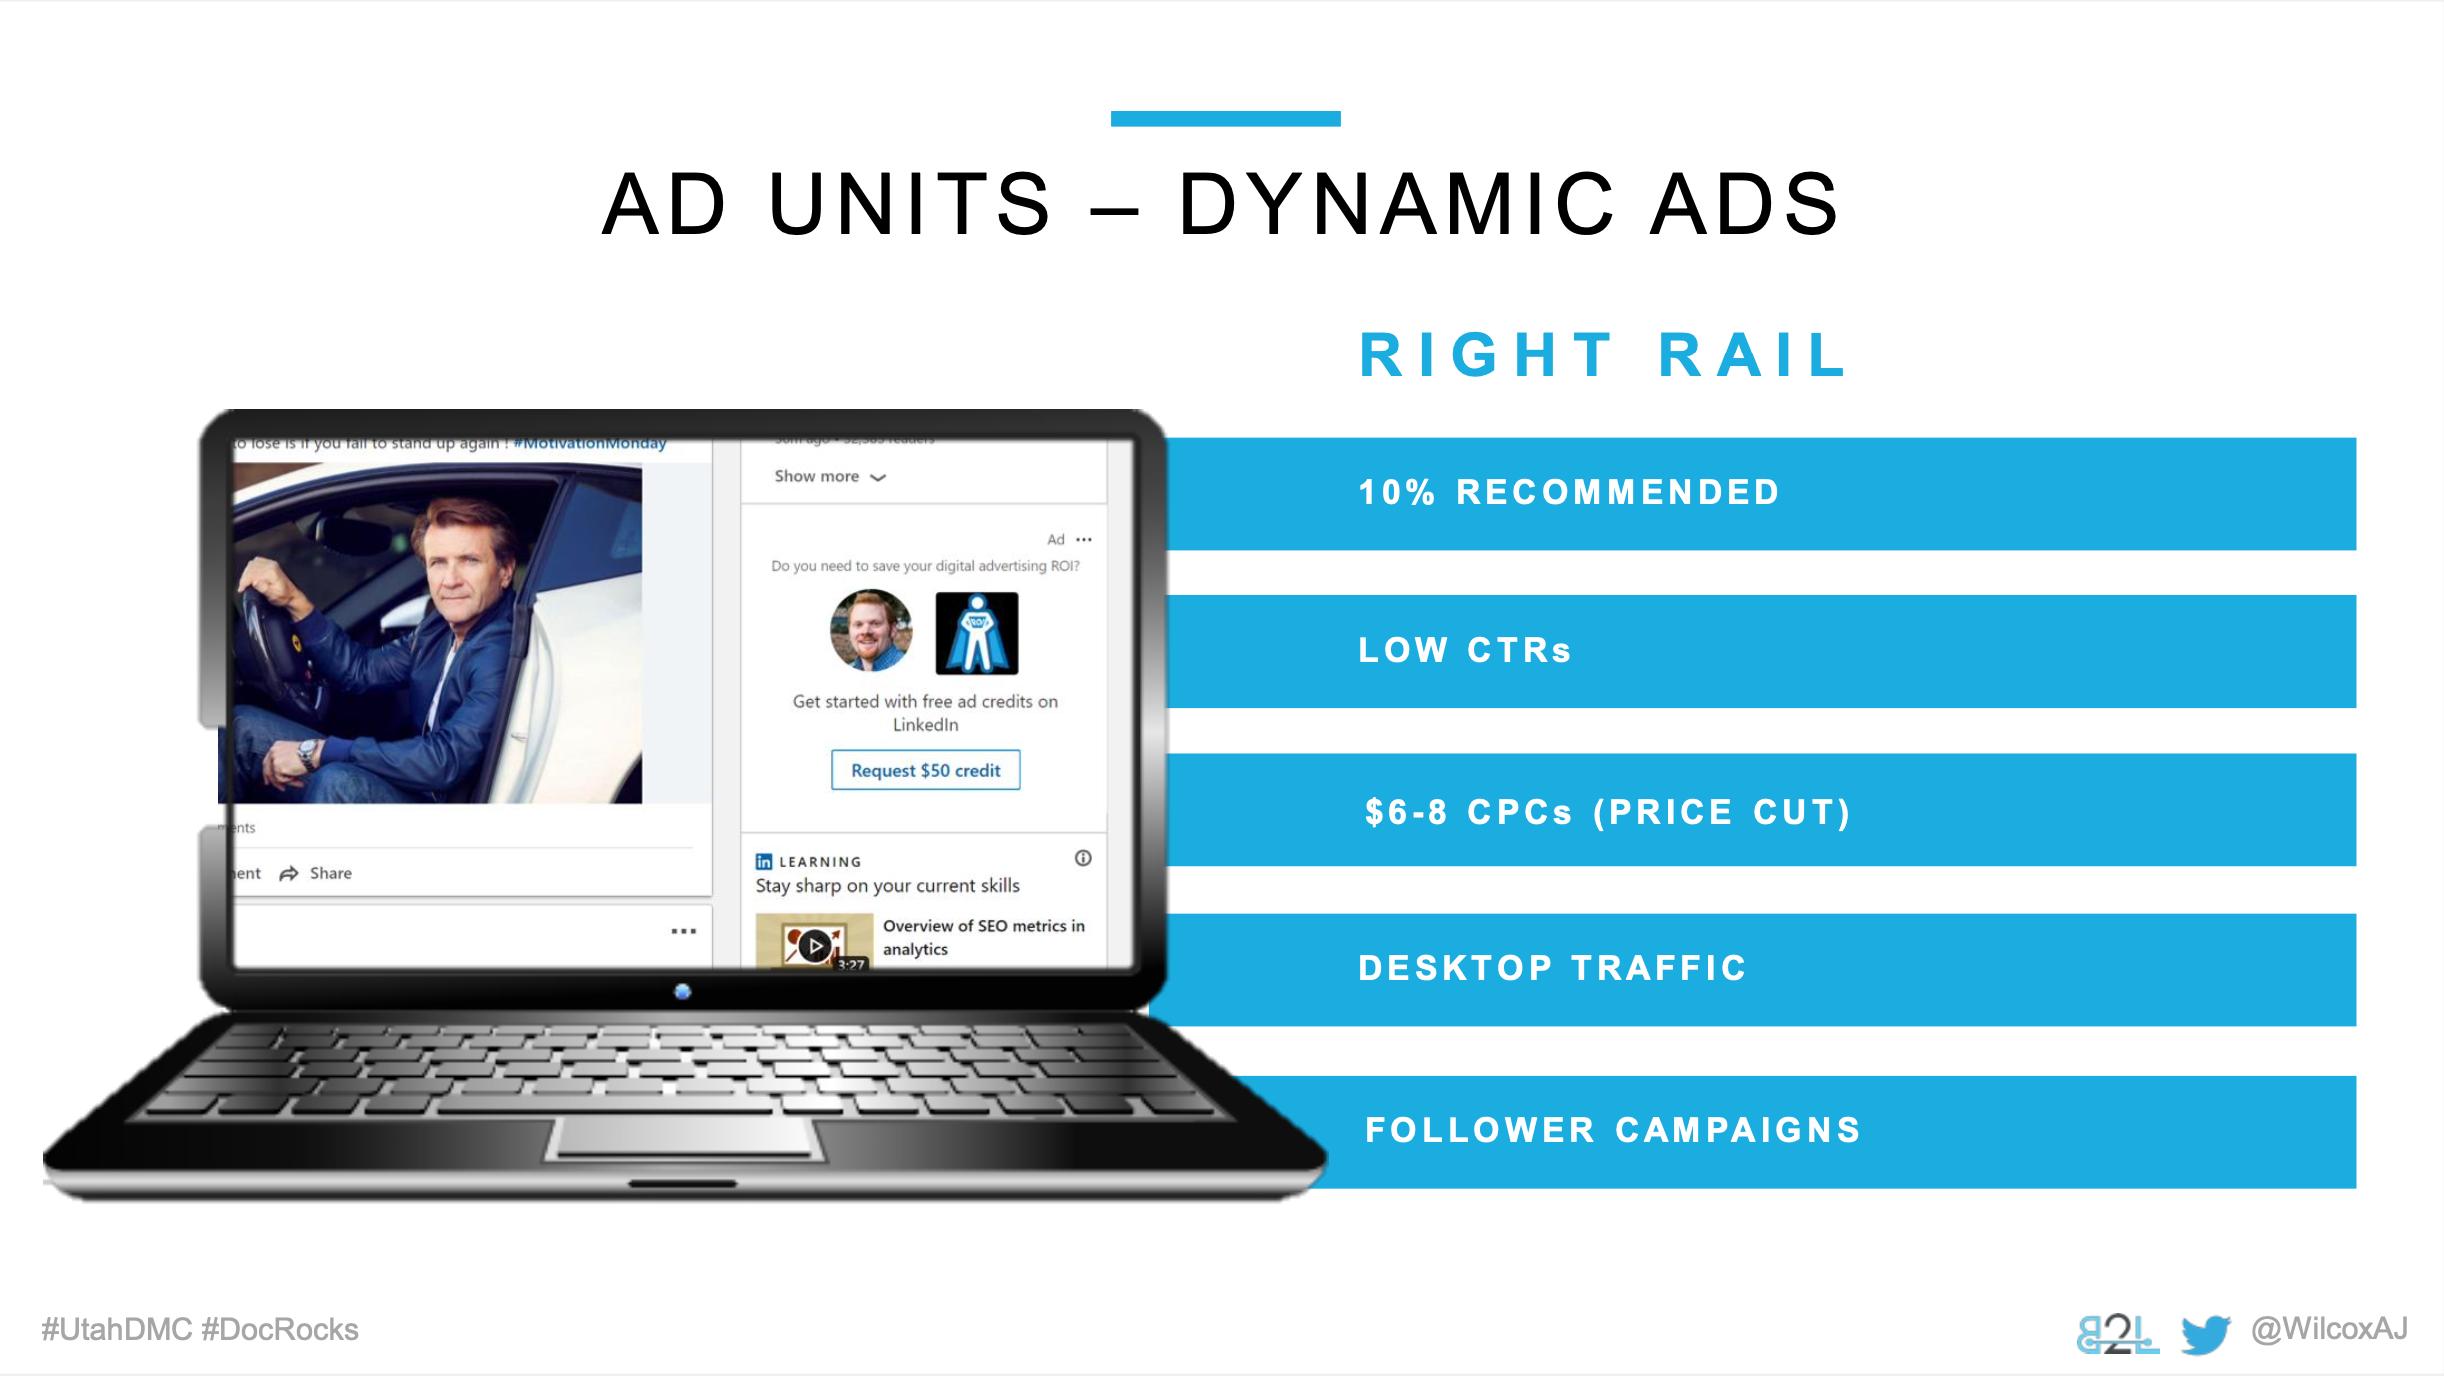 Utah DMC LinkedIn Ads - Aj Wilcox - Ad Units - Dynamic Ads